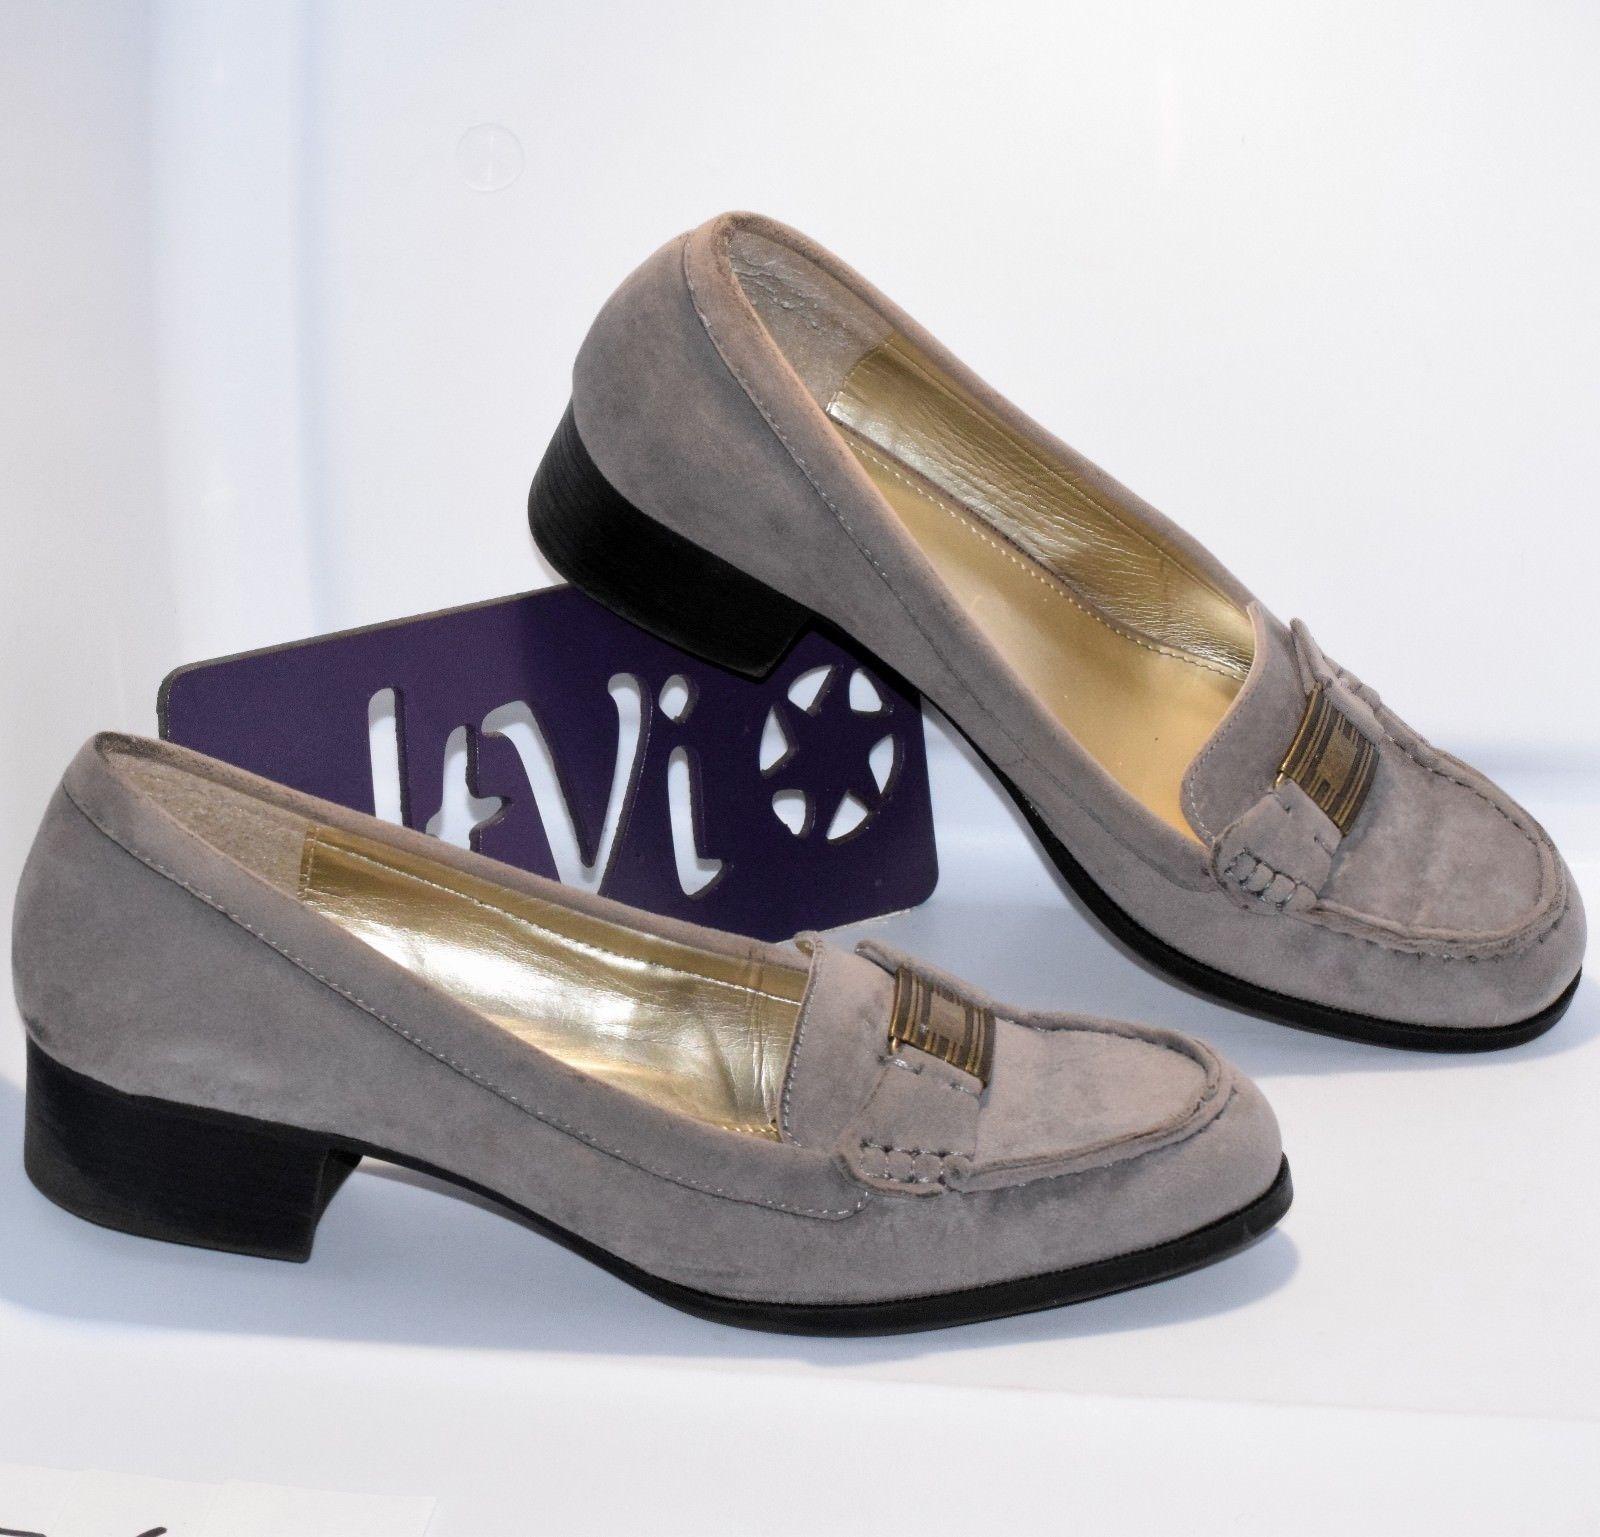 36c65c6eecb Chaps 8B  Percy  Slip-on low block heel loafer oxford Ralph Lauren round